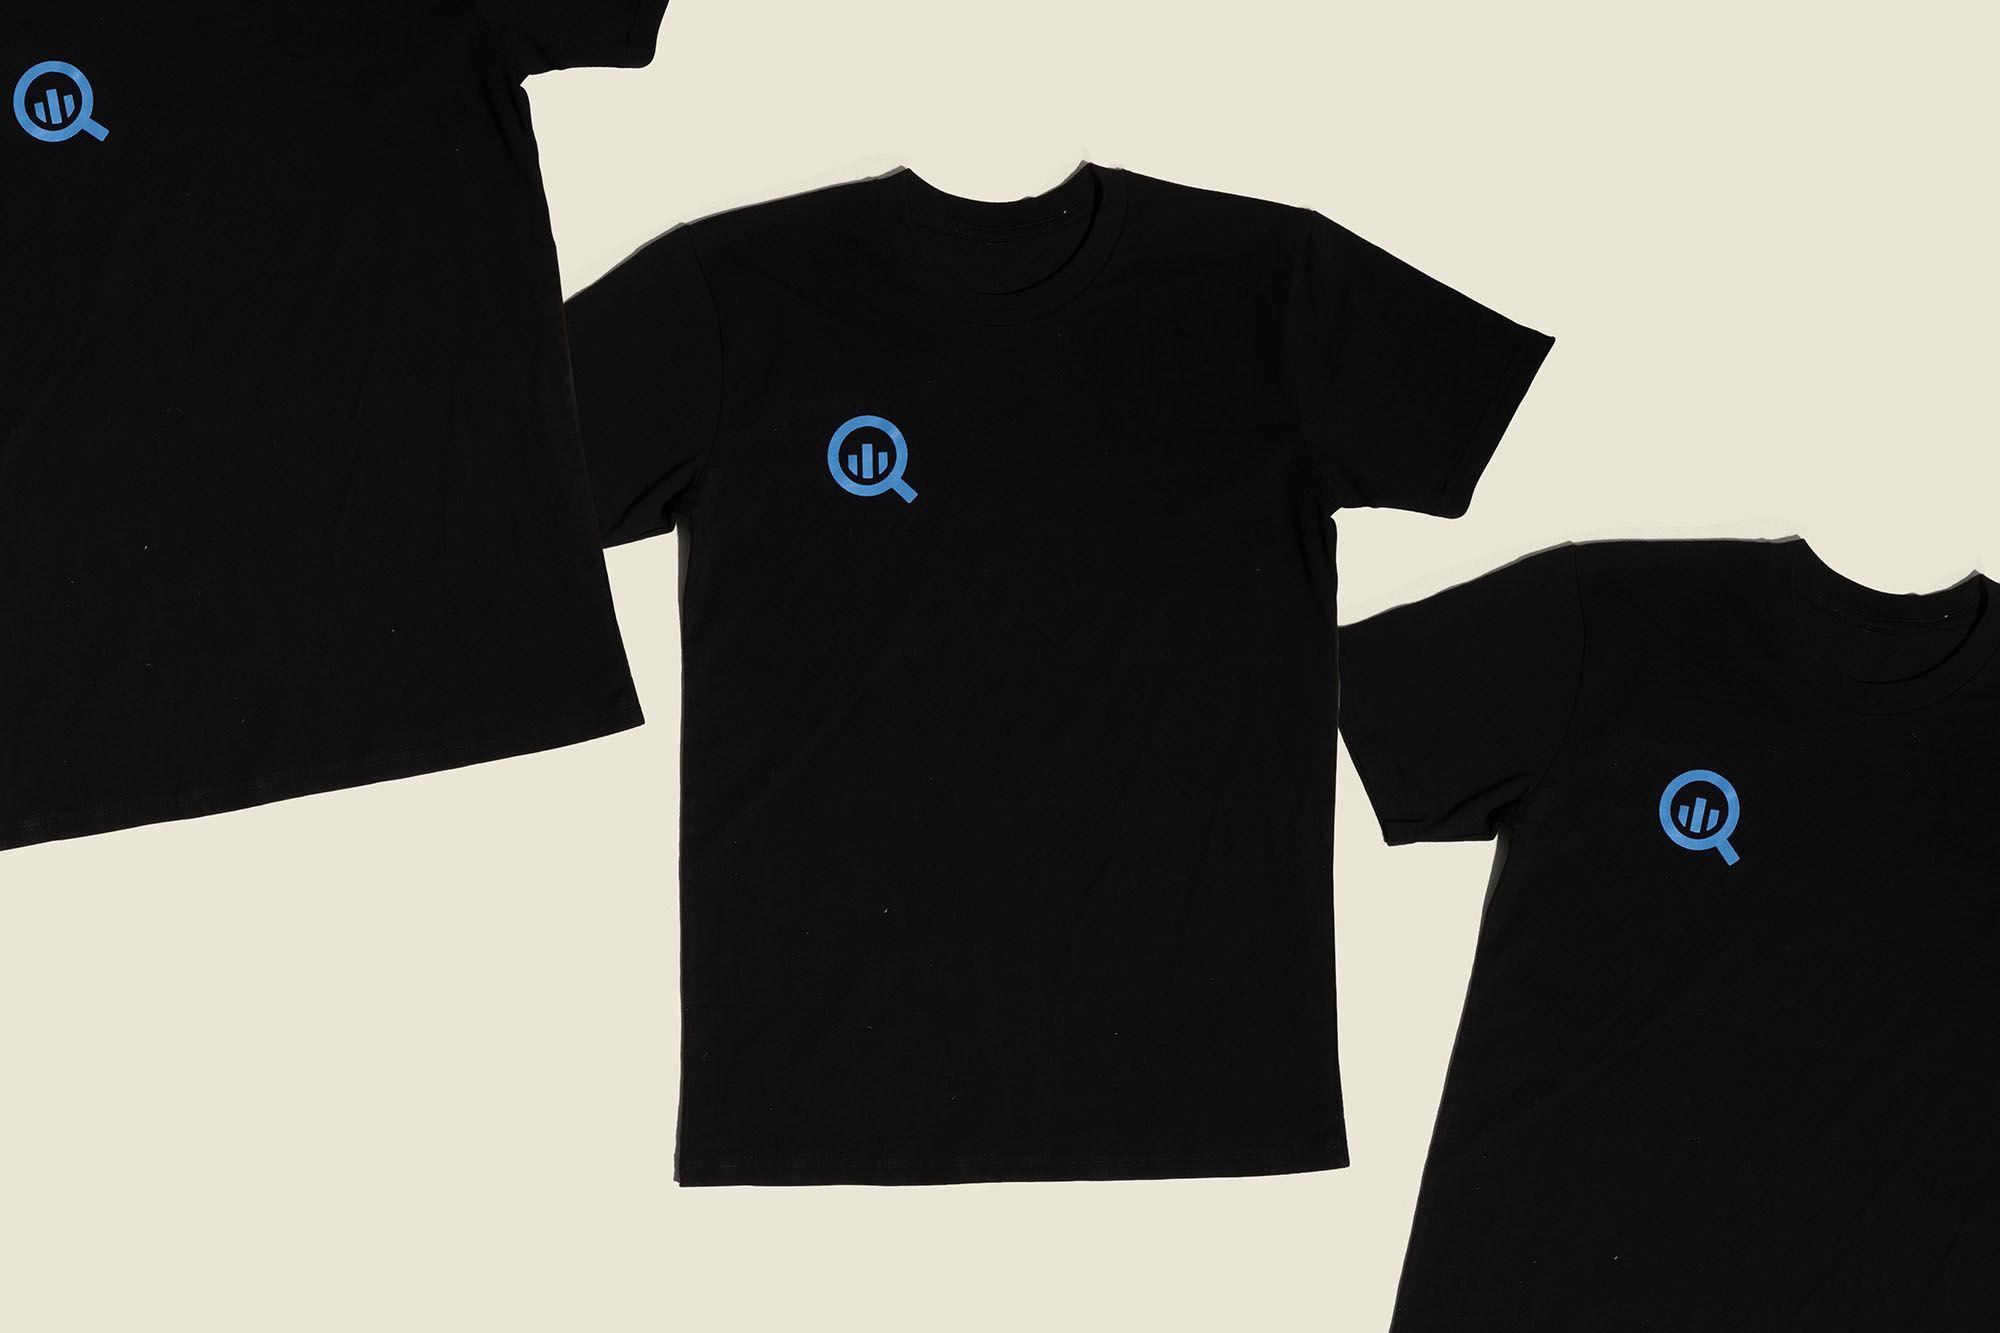 Set of t-shirts